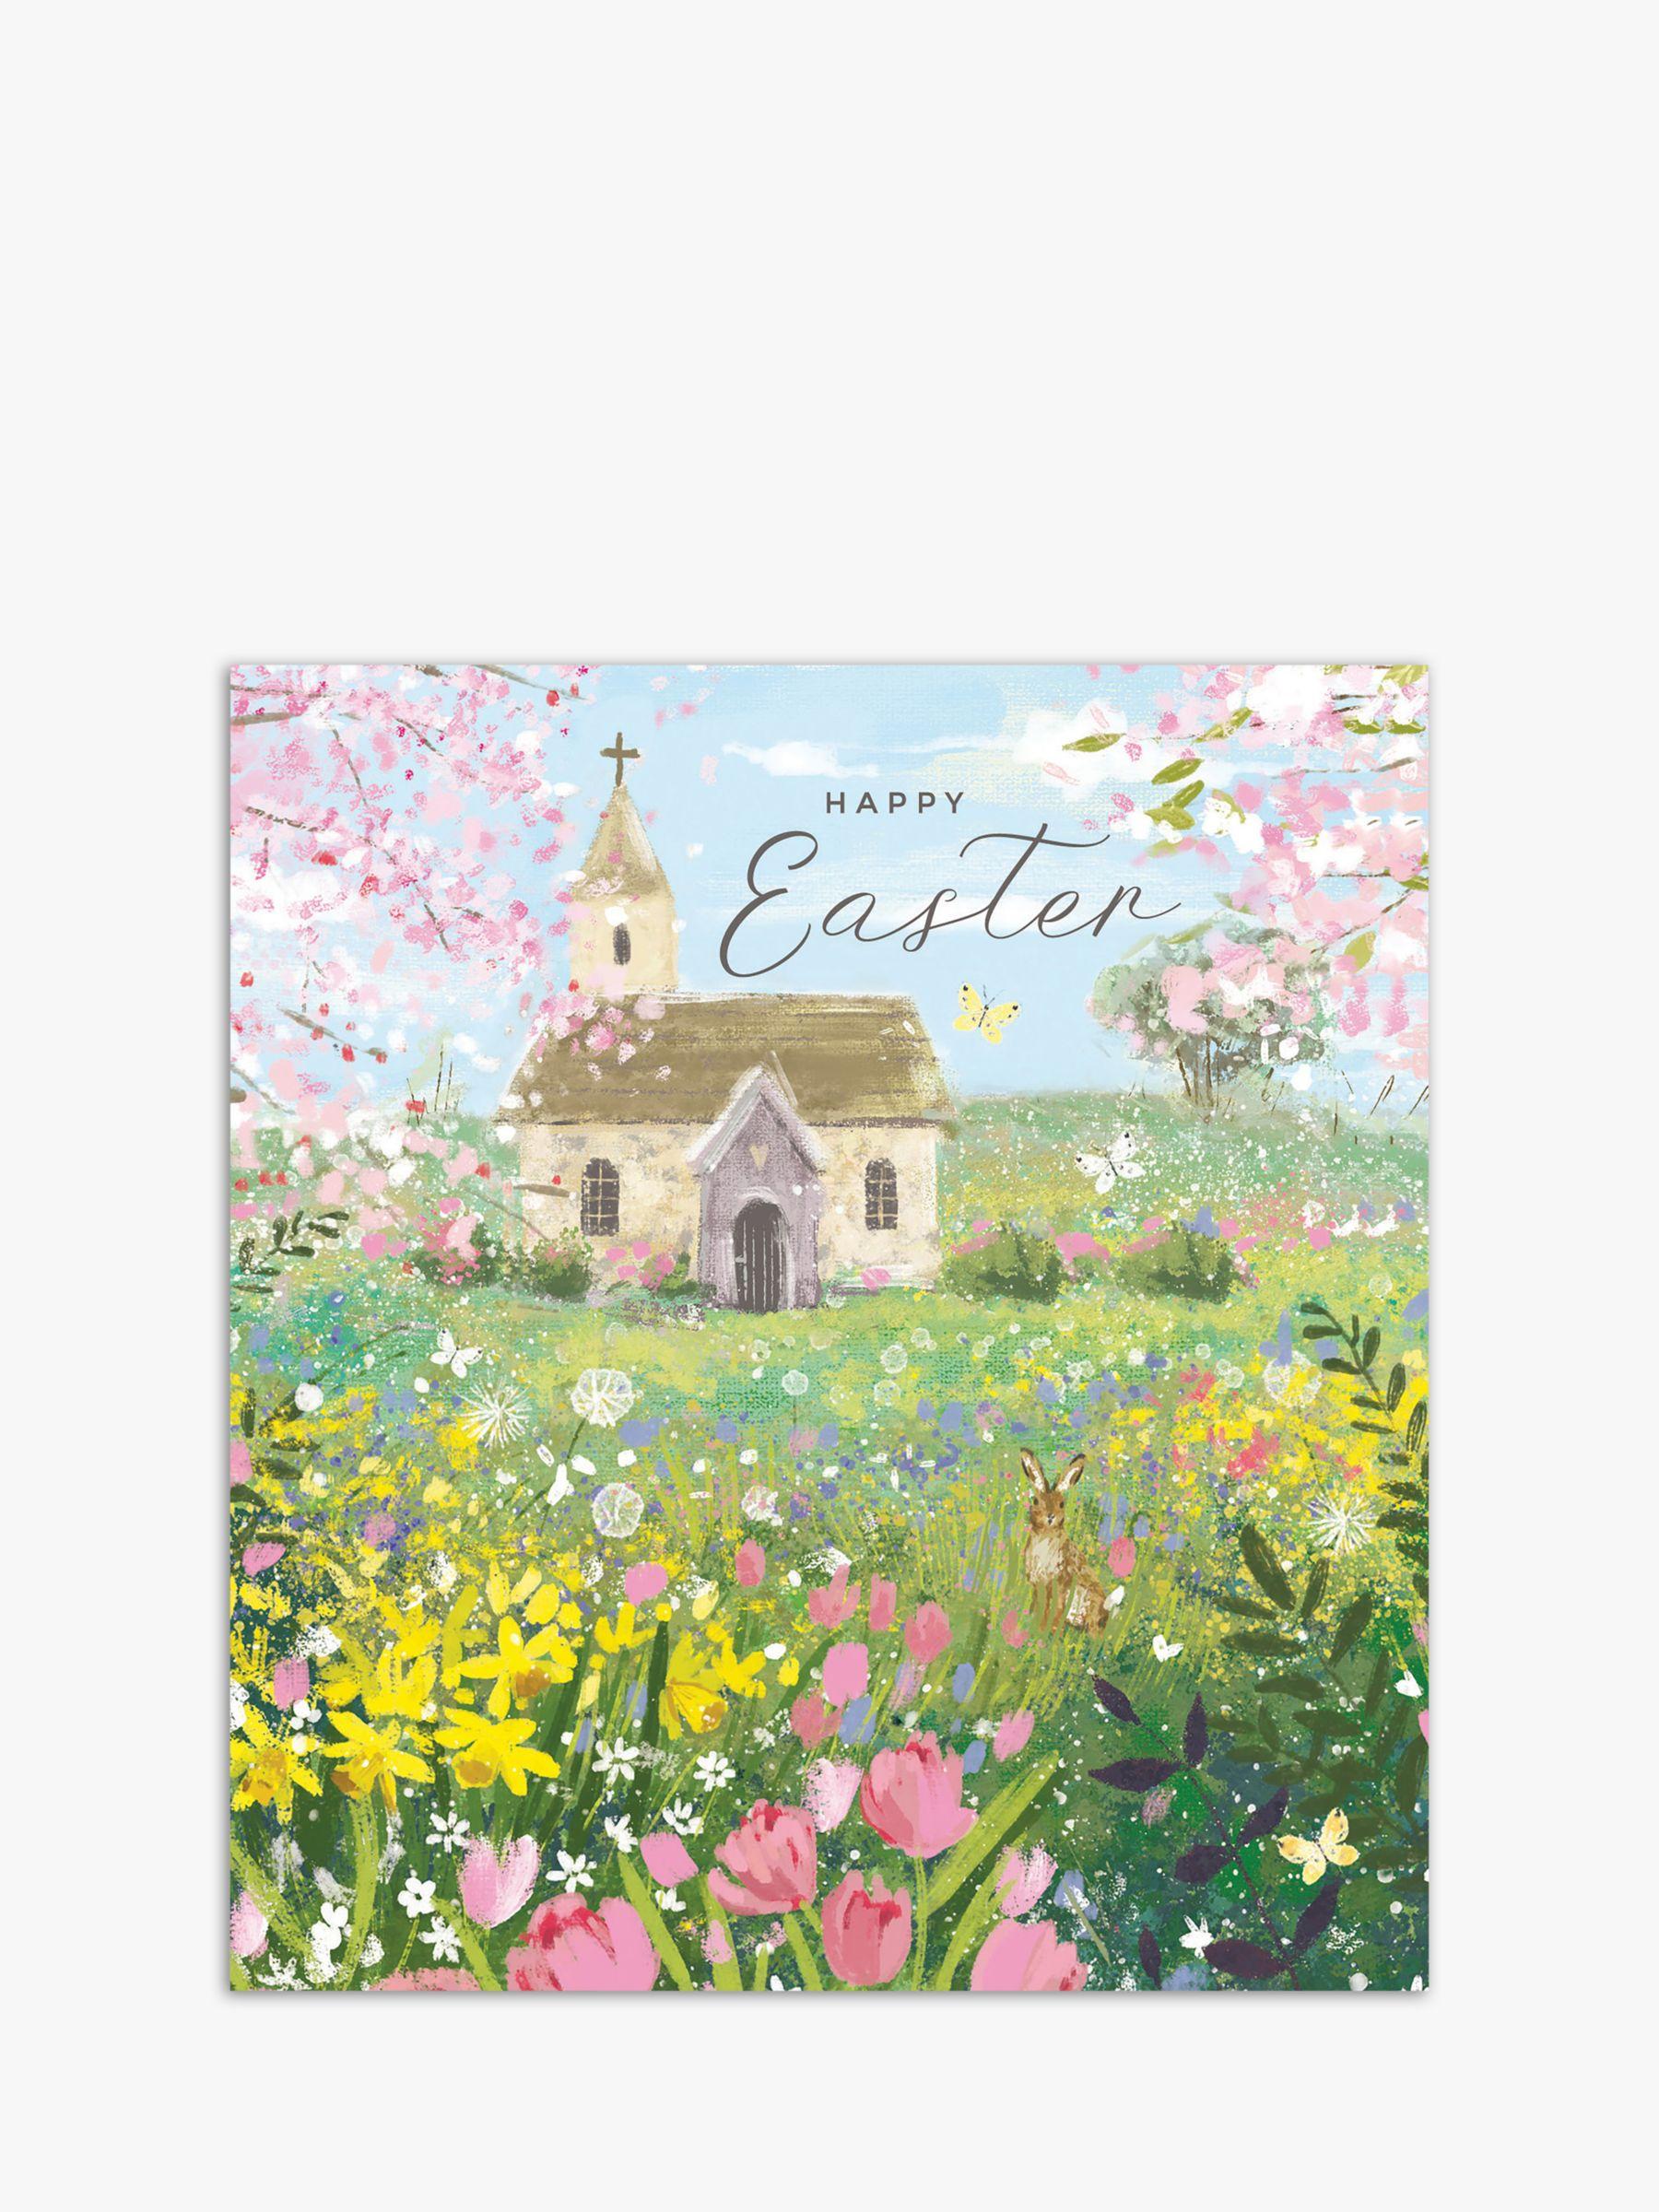 Woodmansterne Woodmansterne Church Easter Cards, Pack of 5